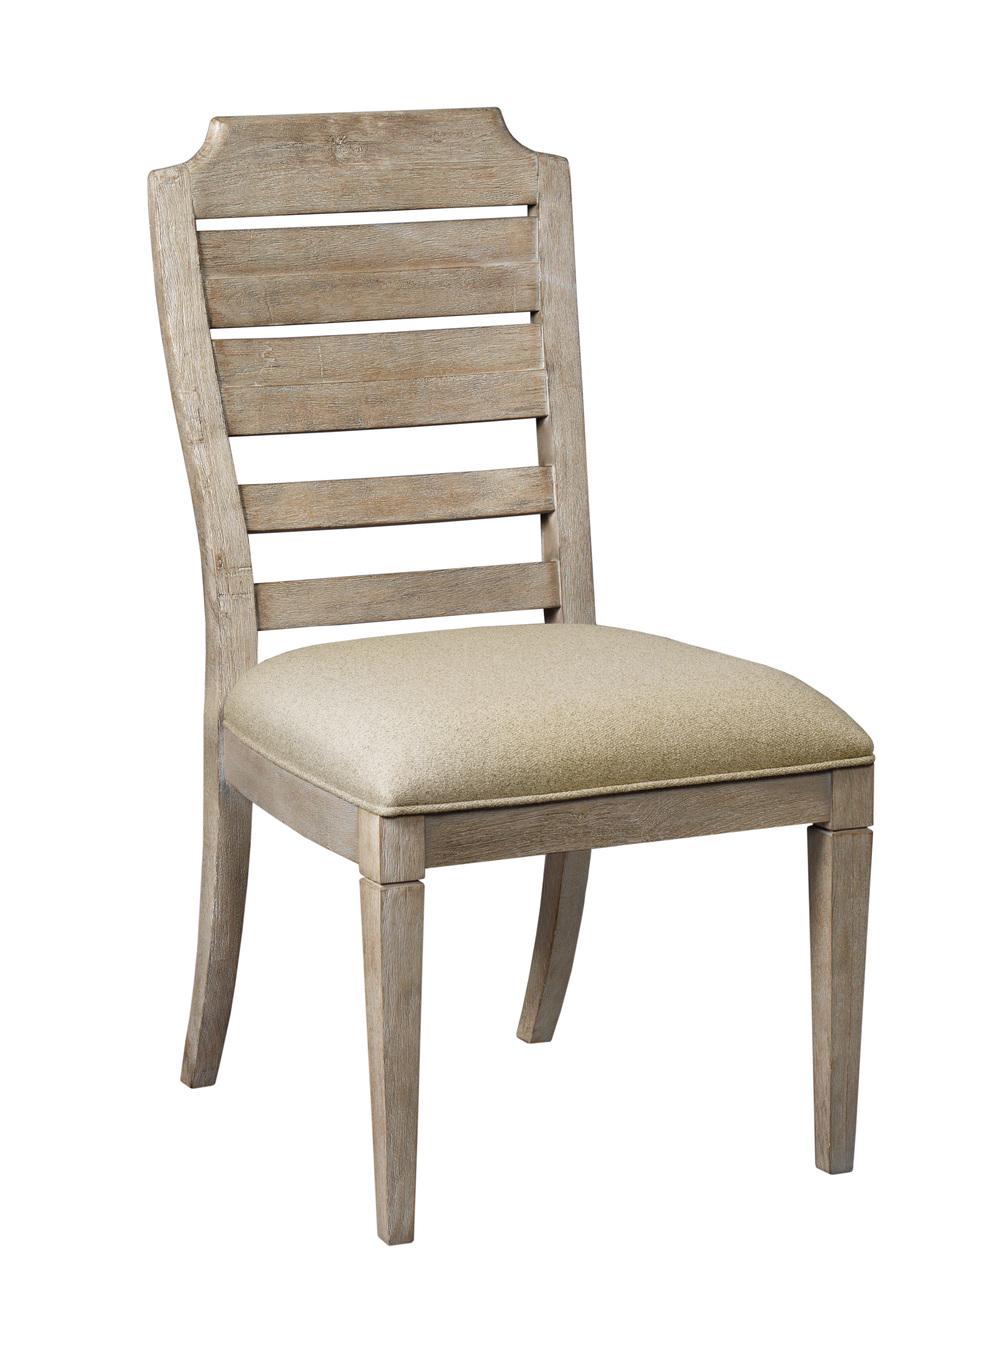 KINCAID FURNITURE CO, INC - Erwin Side Chair